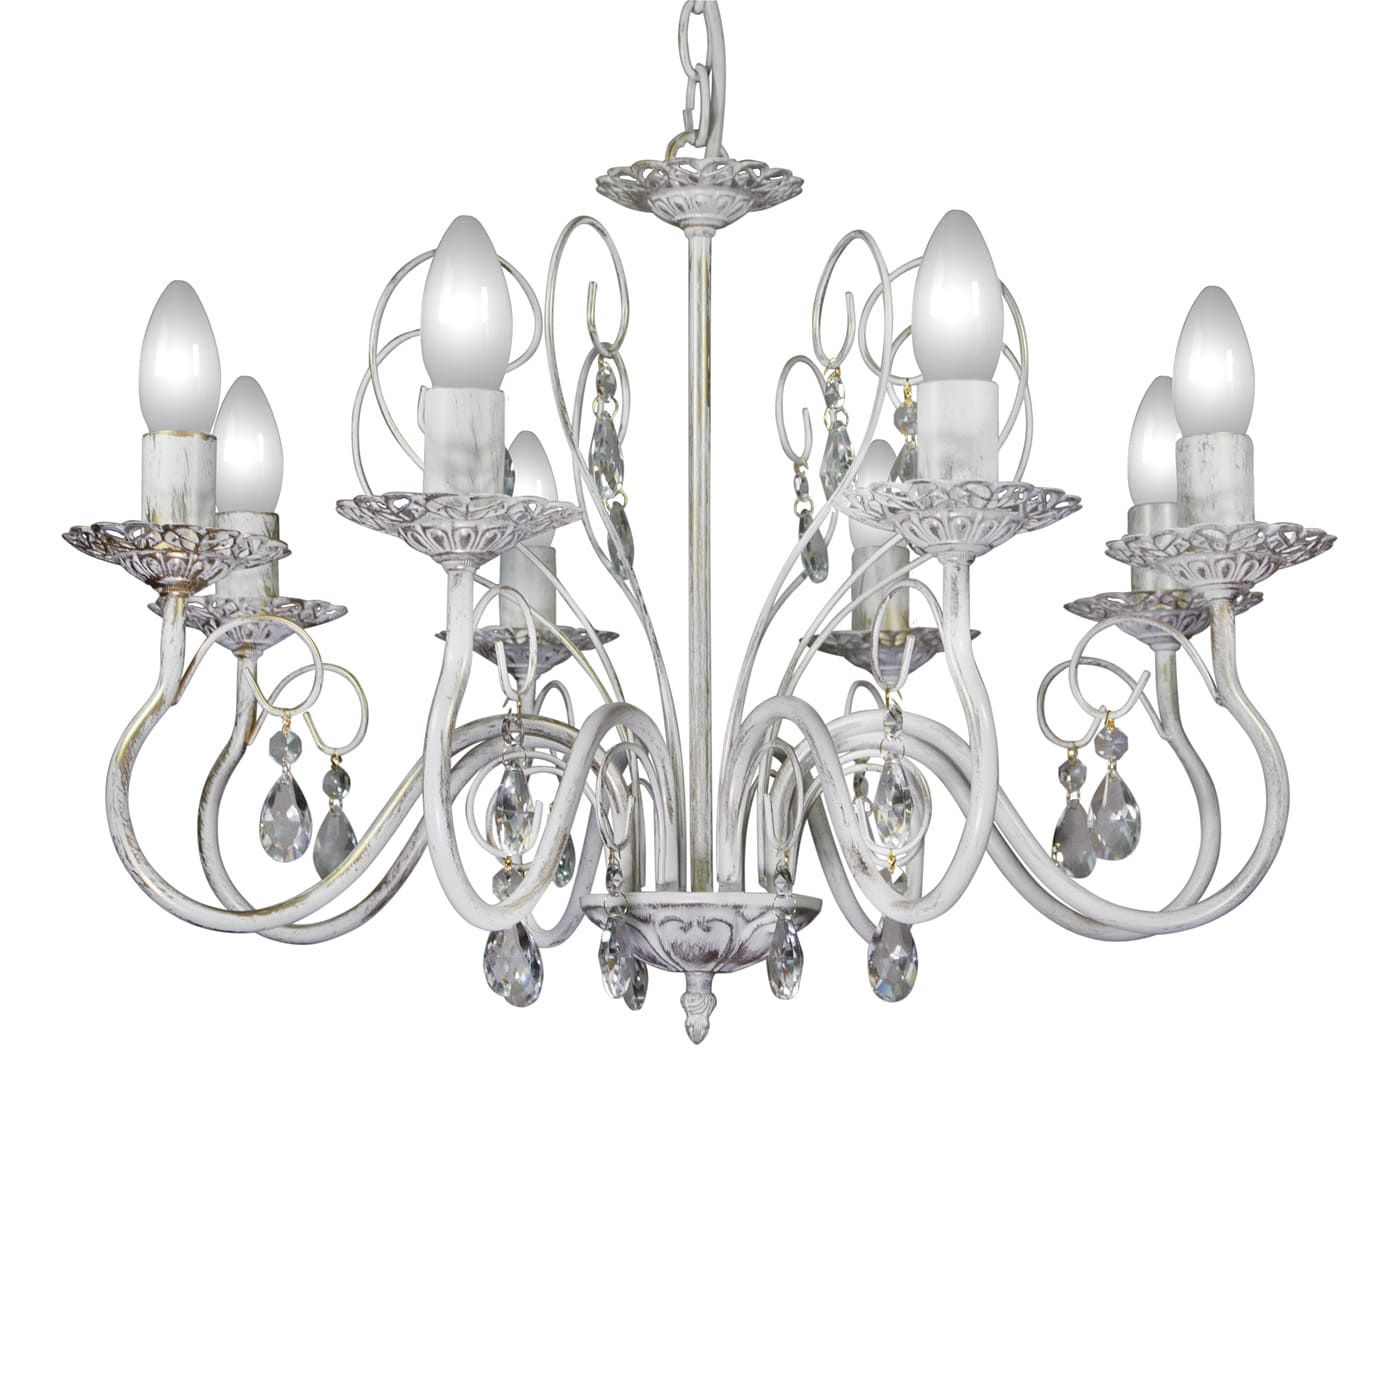 PETRASVET / Pendant chandelier S1163-8, 8xE14 max. 60W